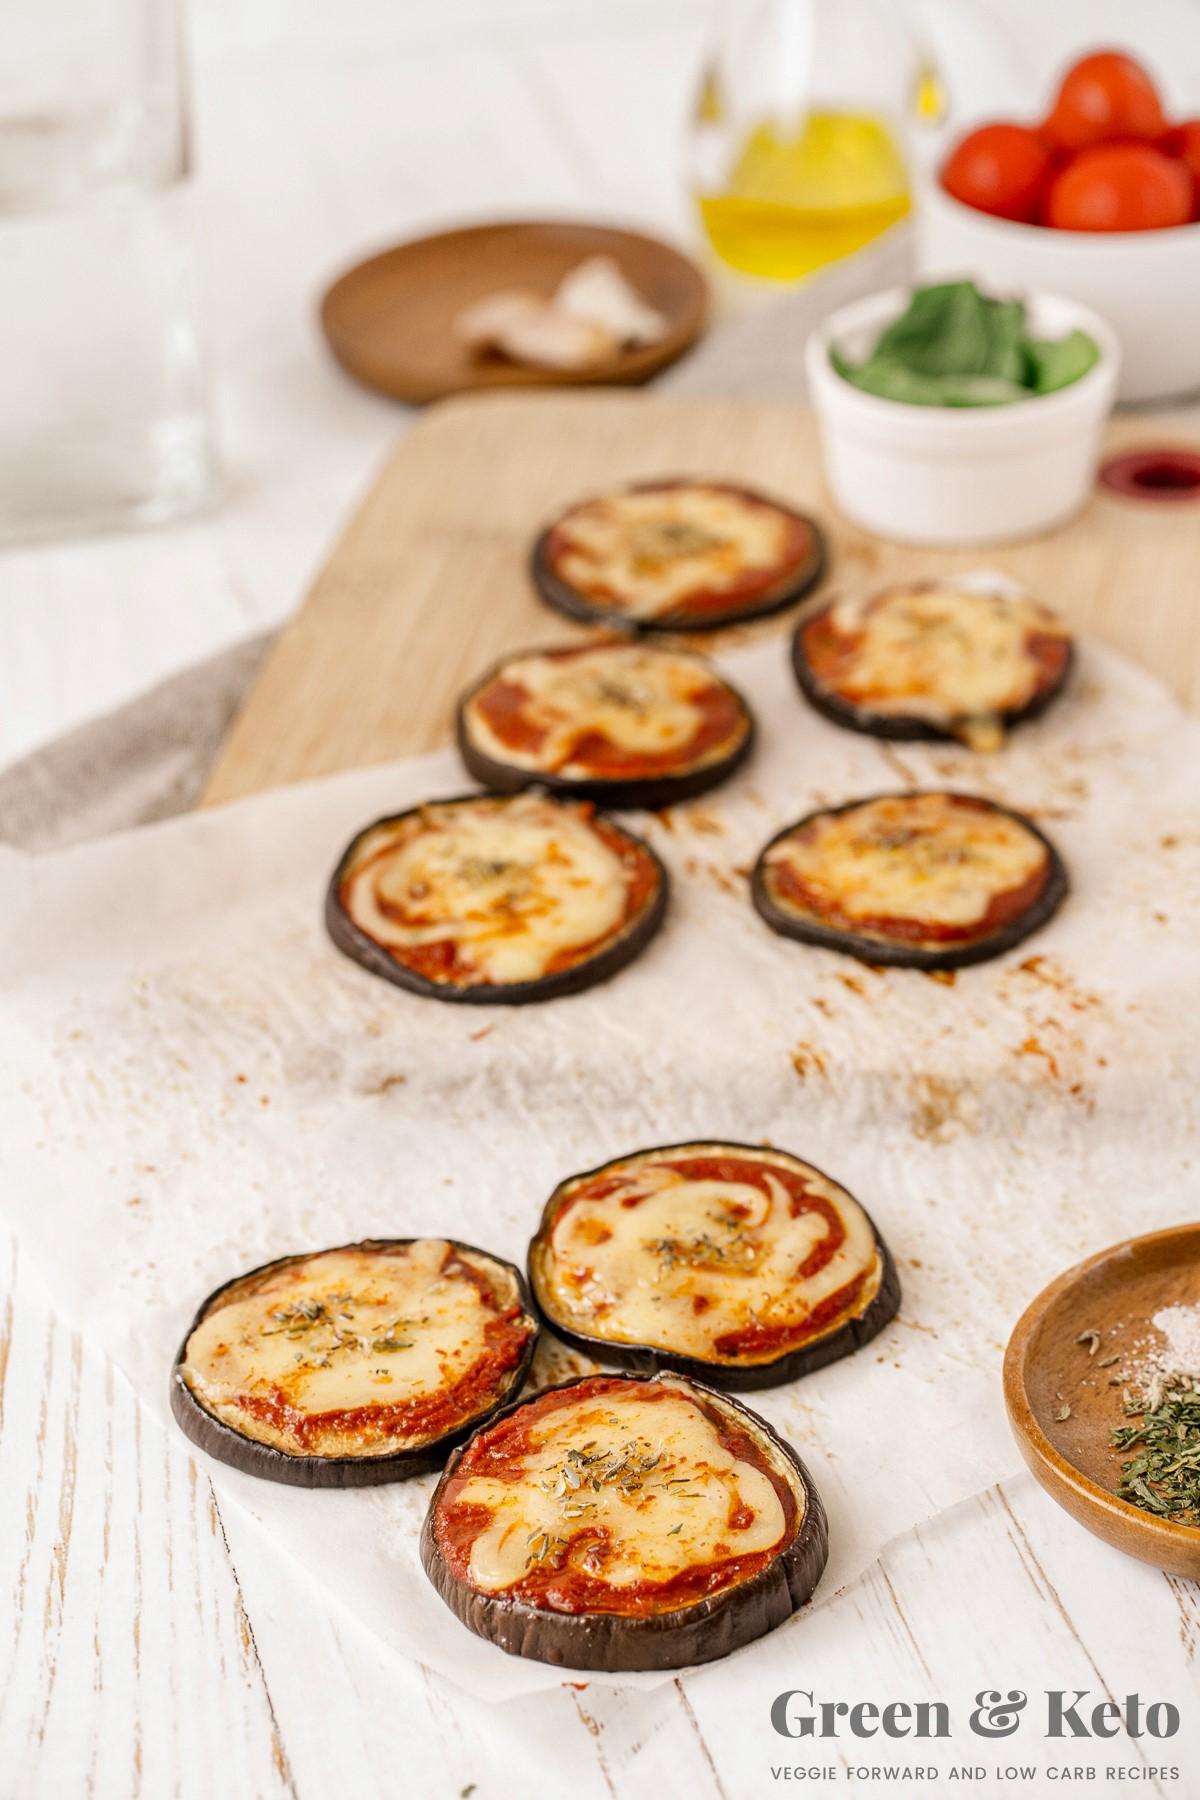 Keto Eggplant Parmesan (Recipe)